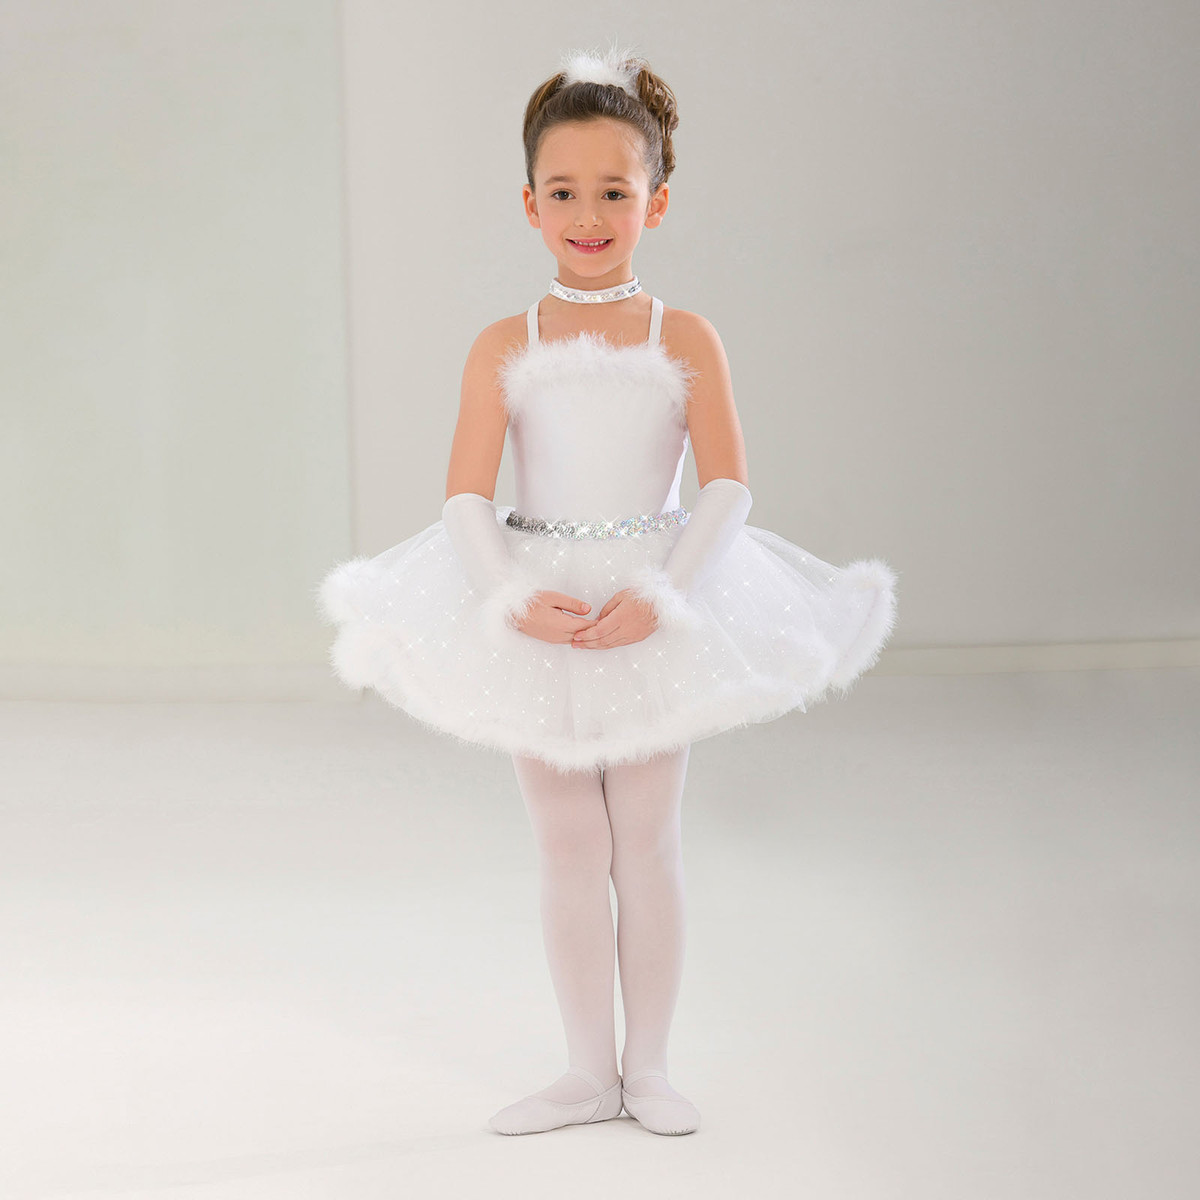 Marshmallow World Choreography